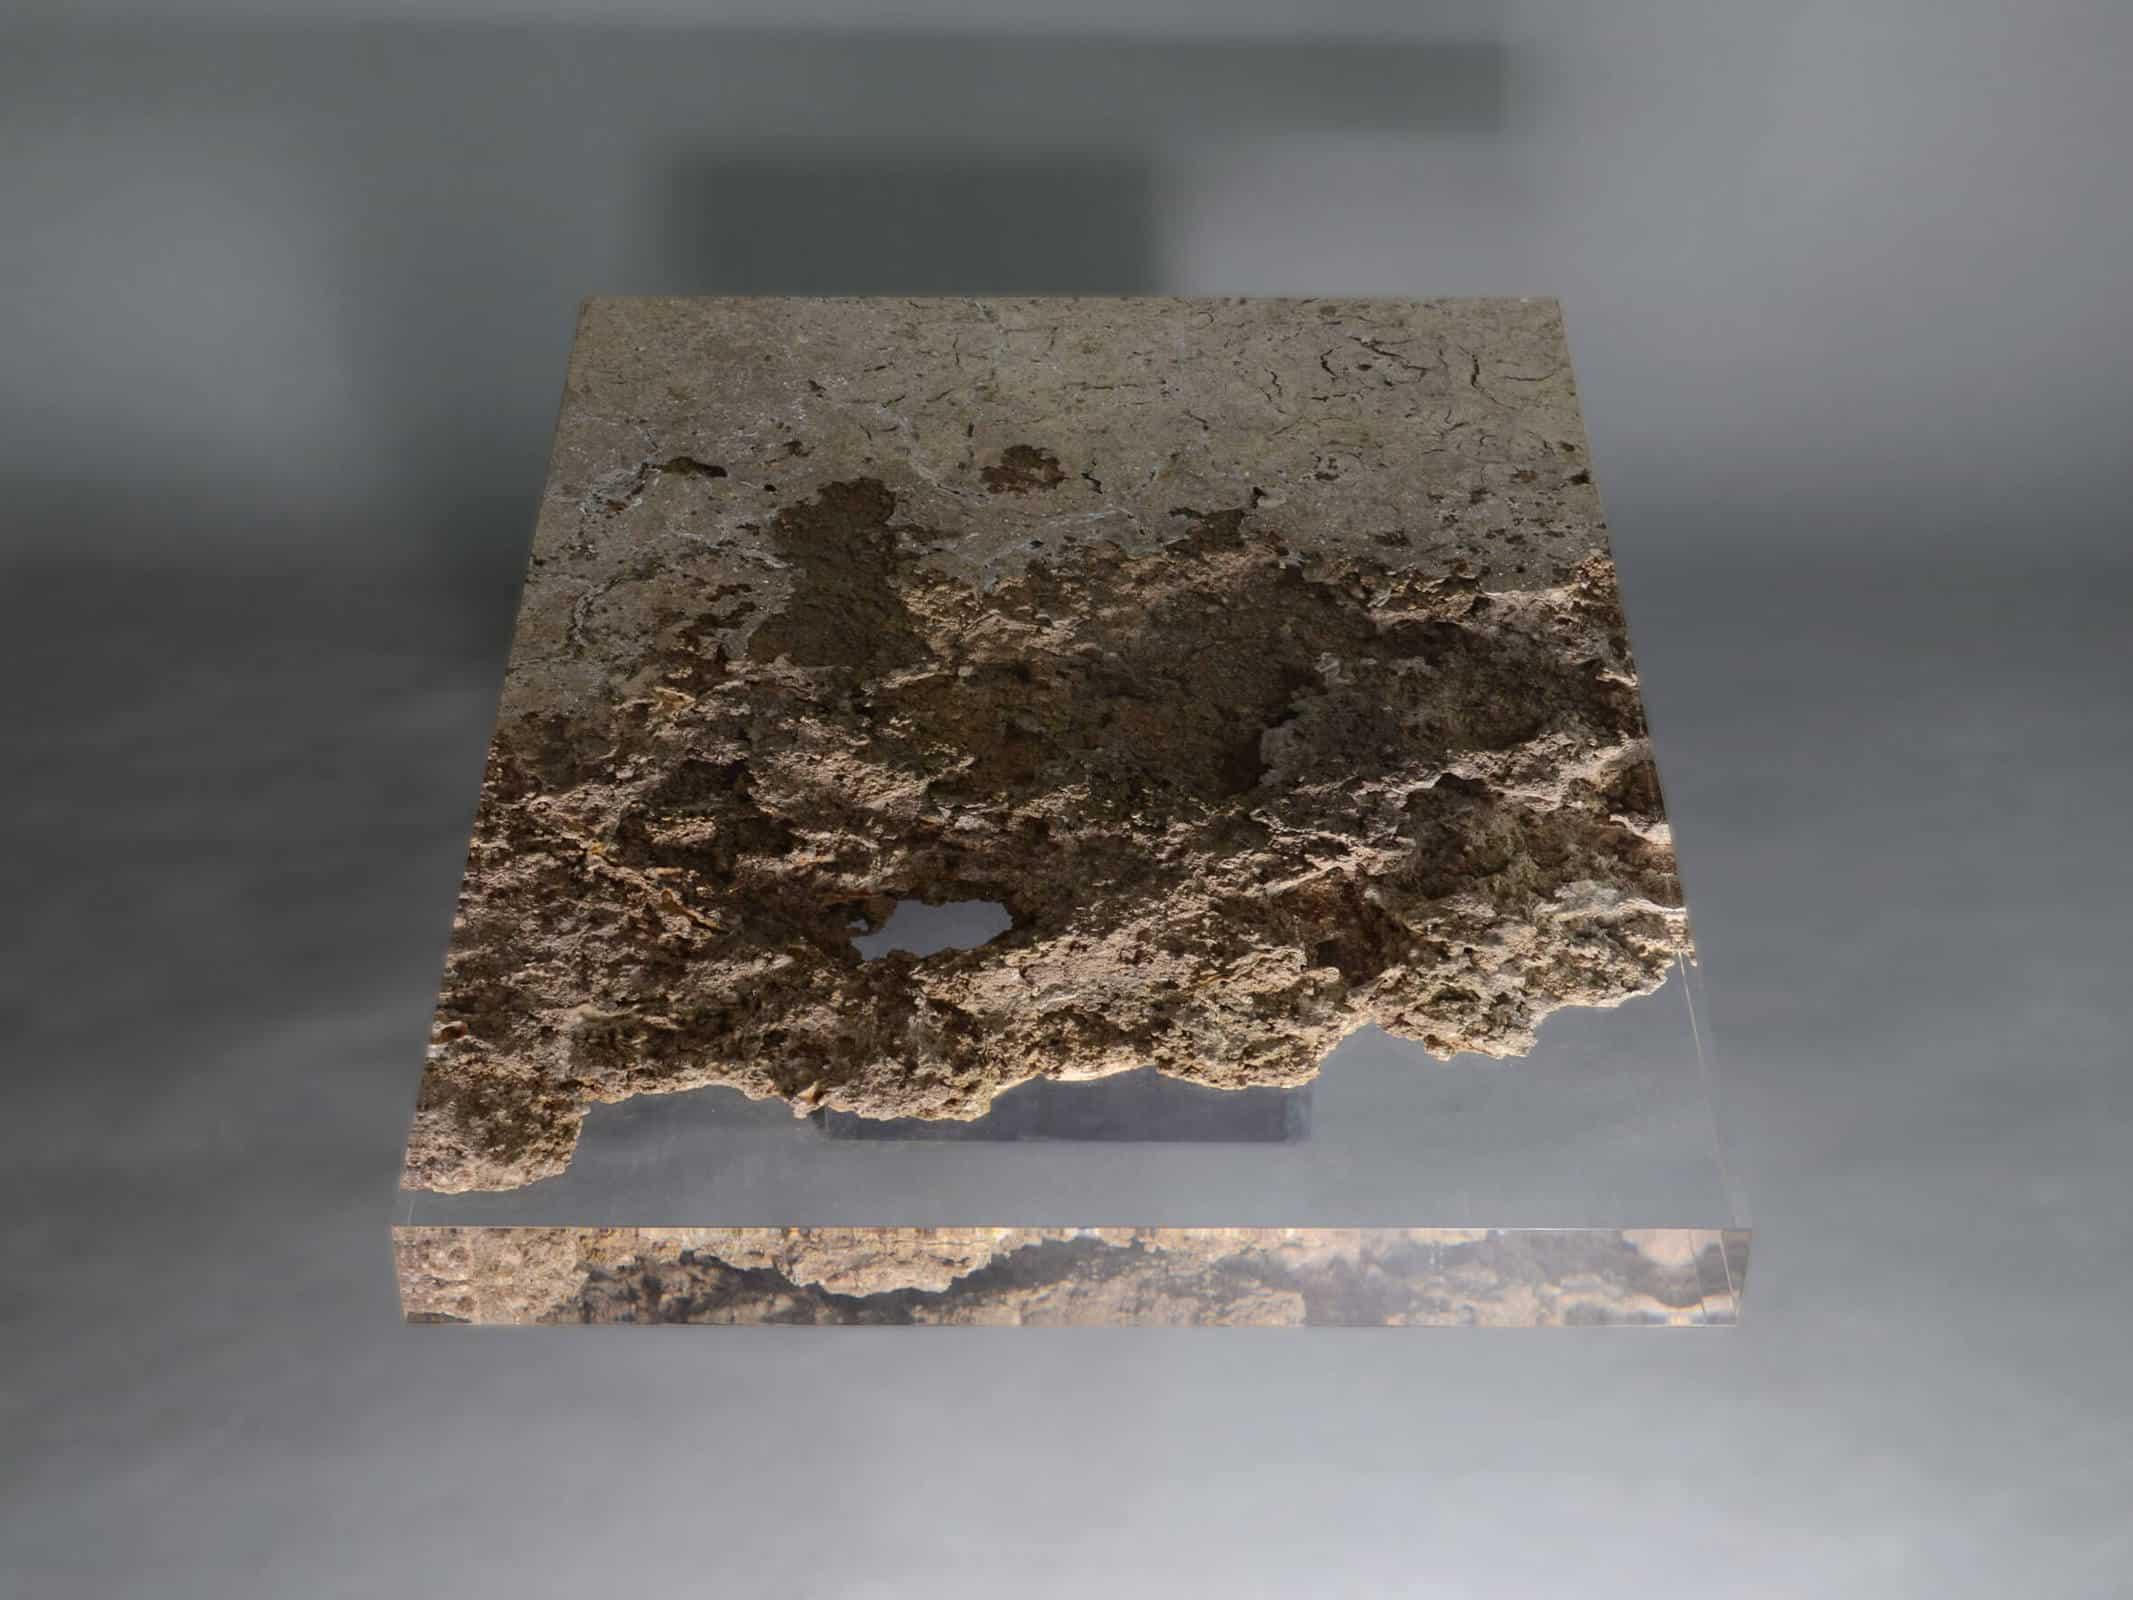 Alcarol nicola gallizia 12